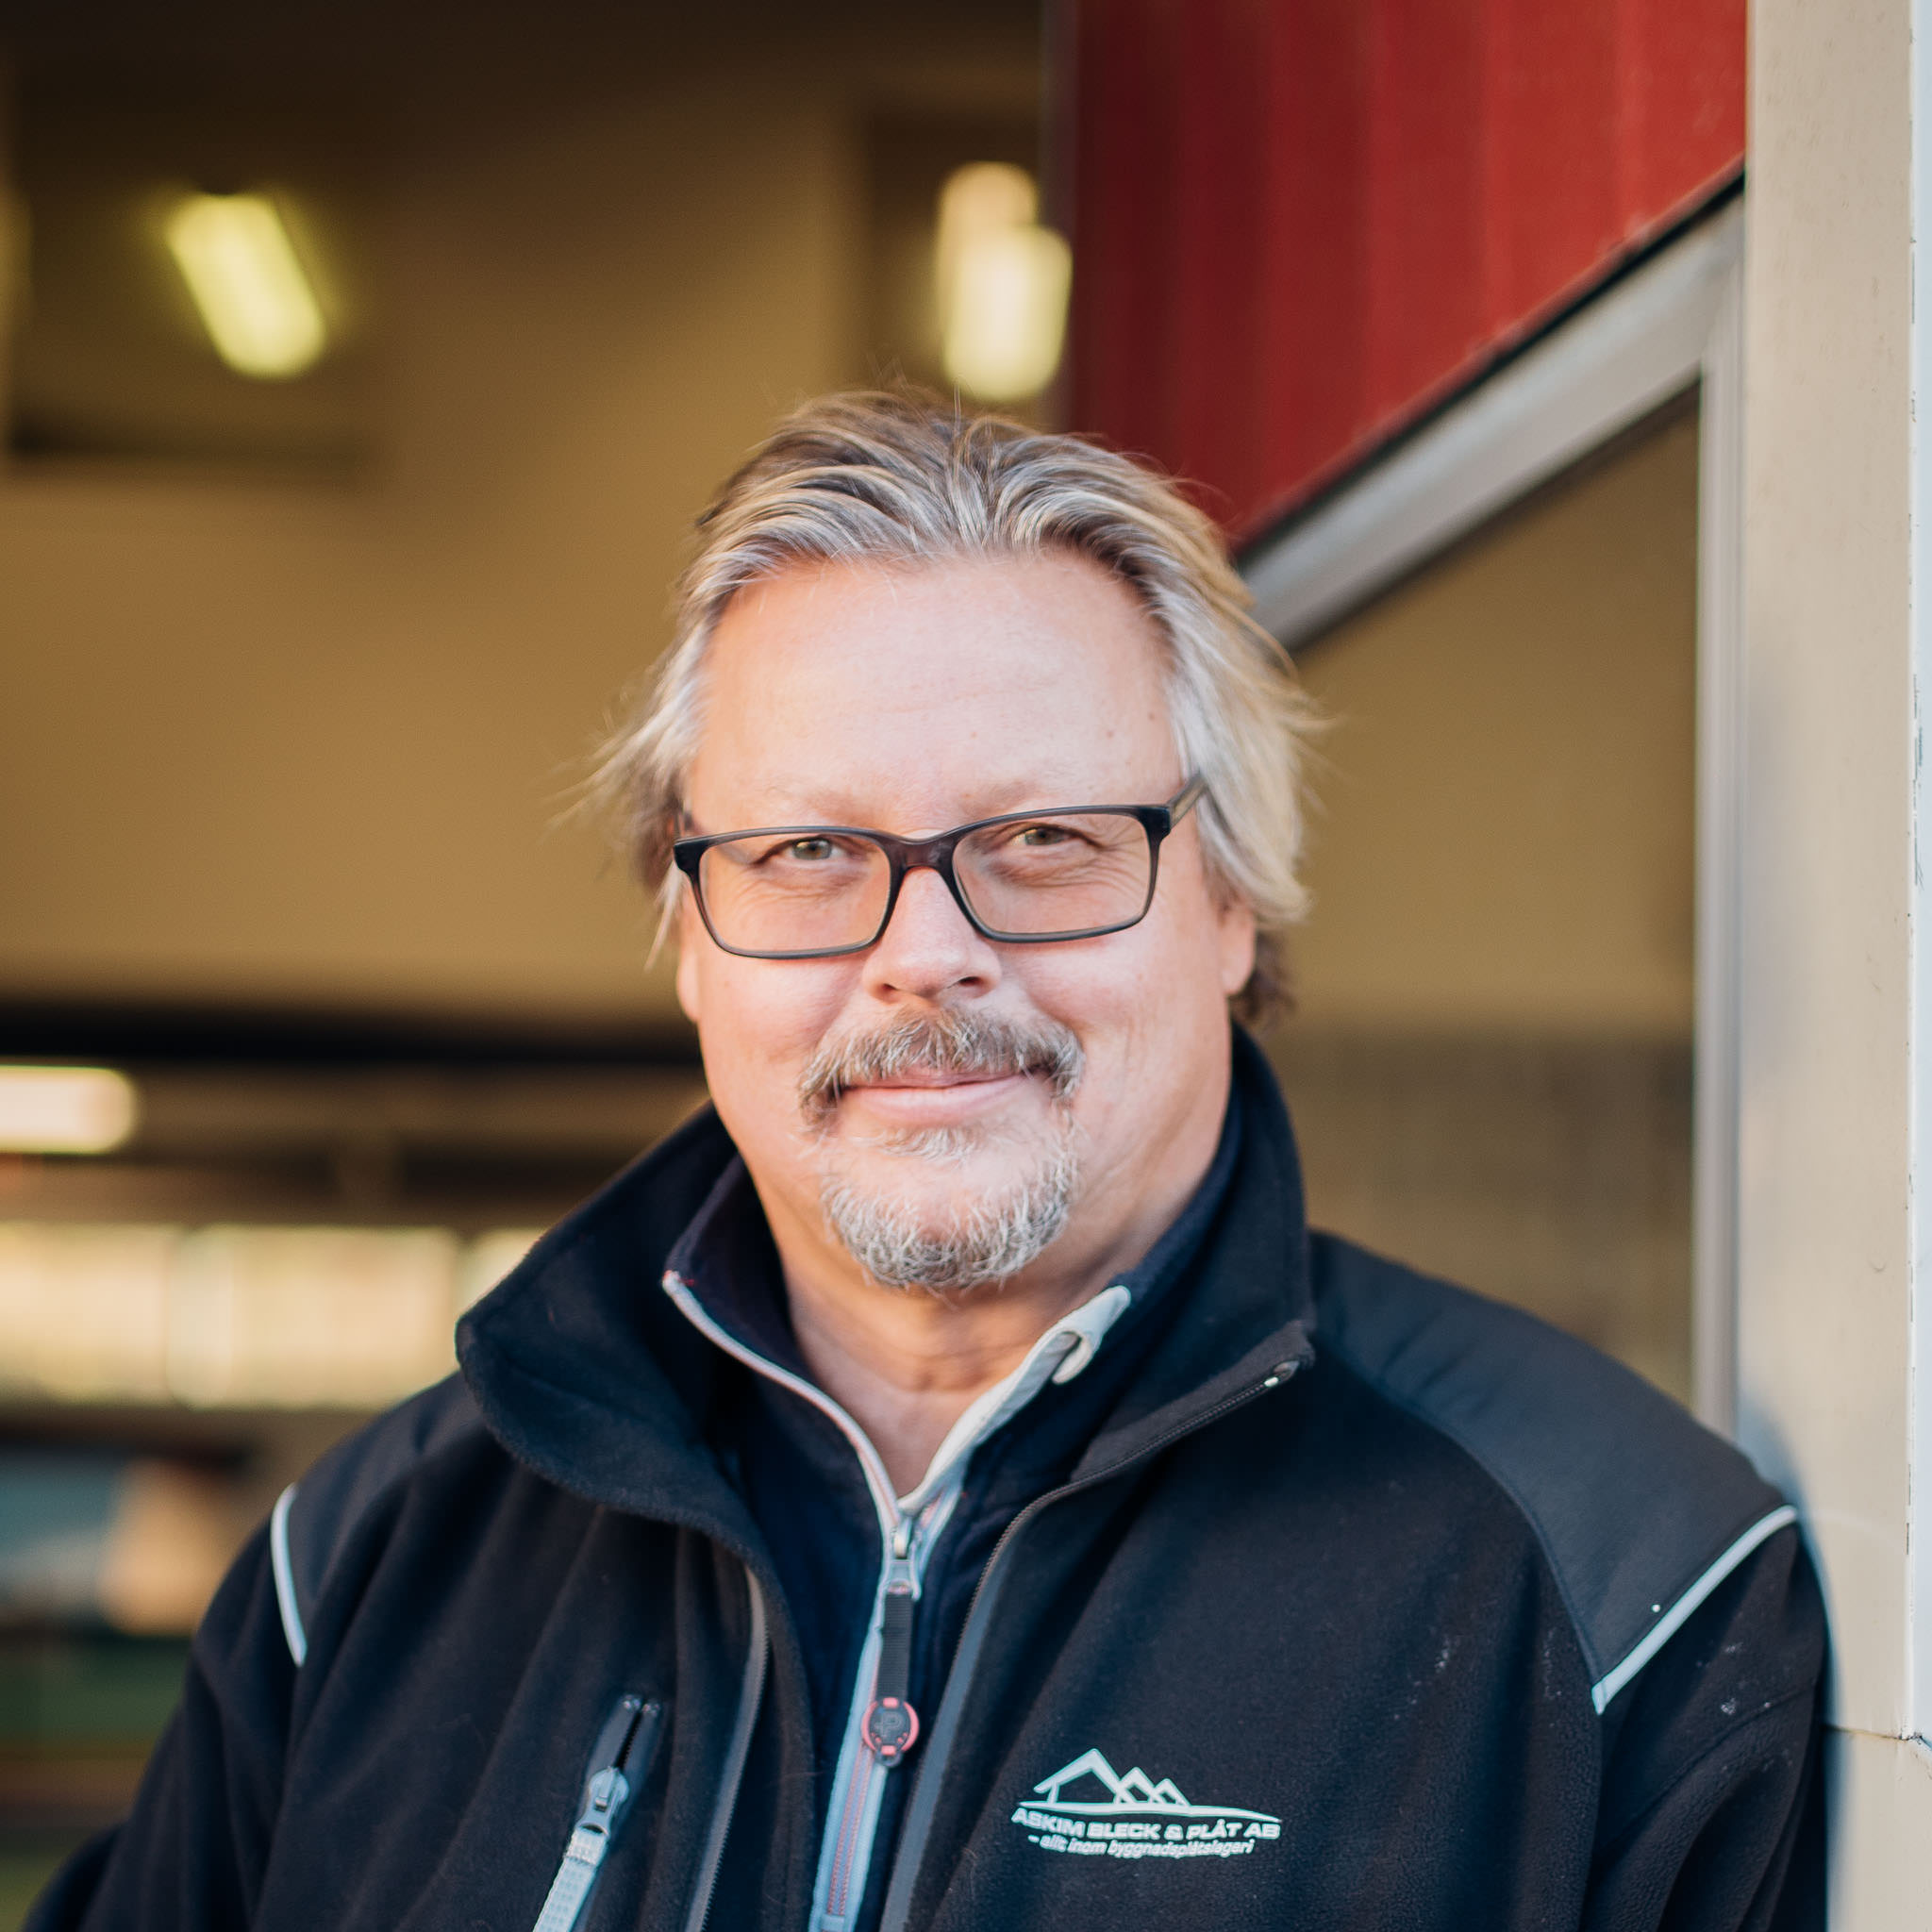 Plåtslagare Göteborg Skorsten Hängrännor Plåtarbete Byggnadsplåtslageri